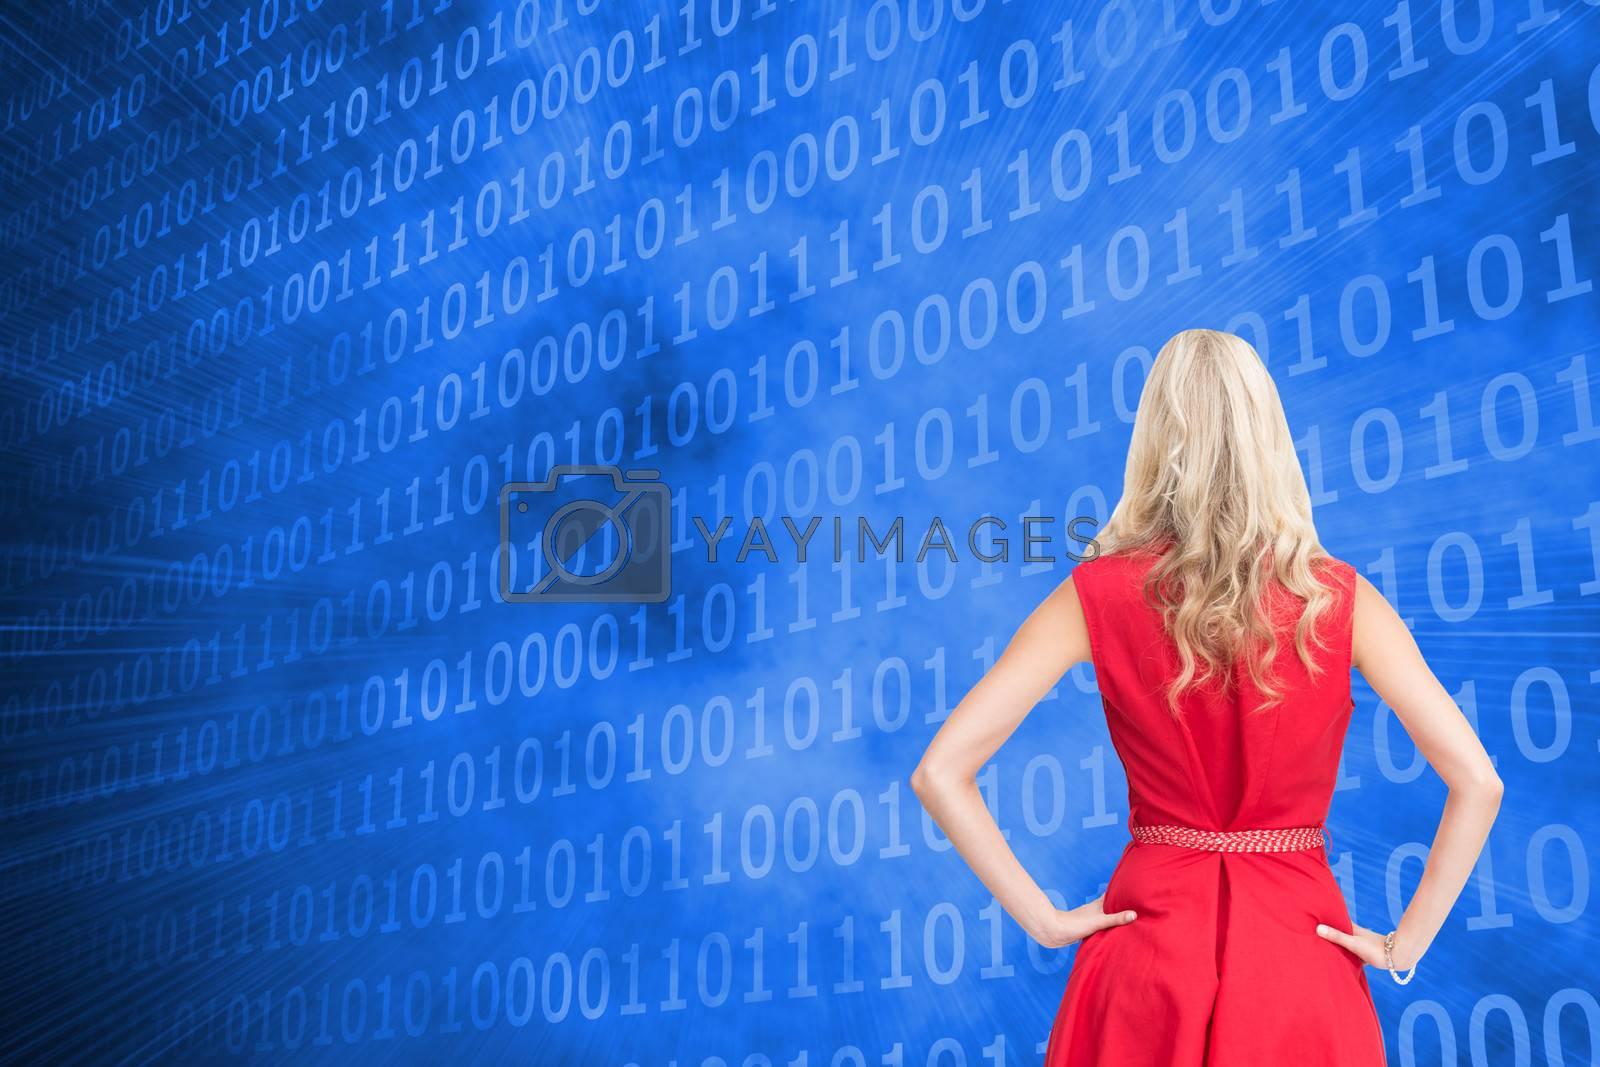 Composite image of elegant blonde standing hands on hips in red dress